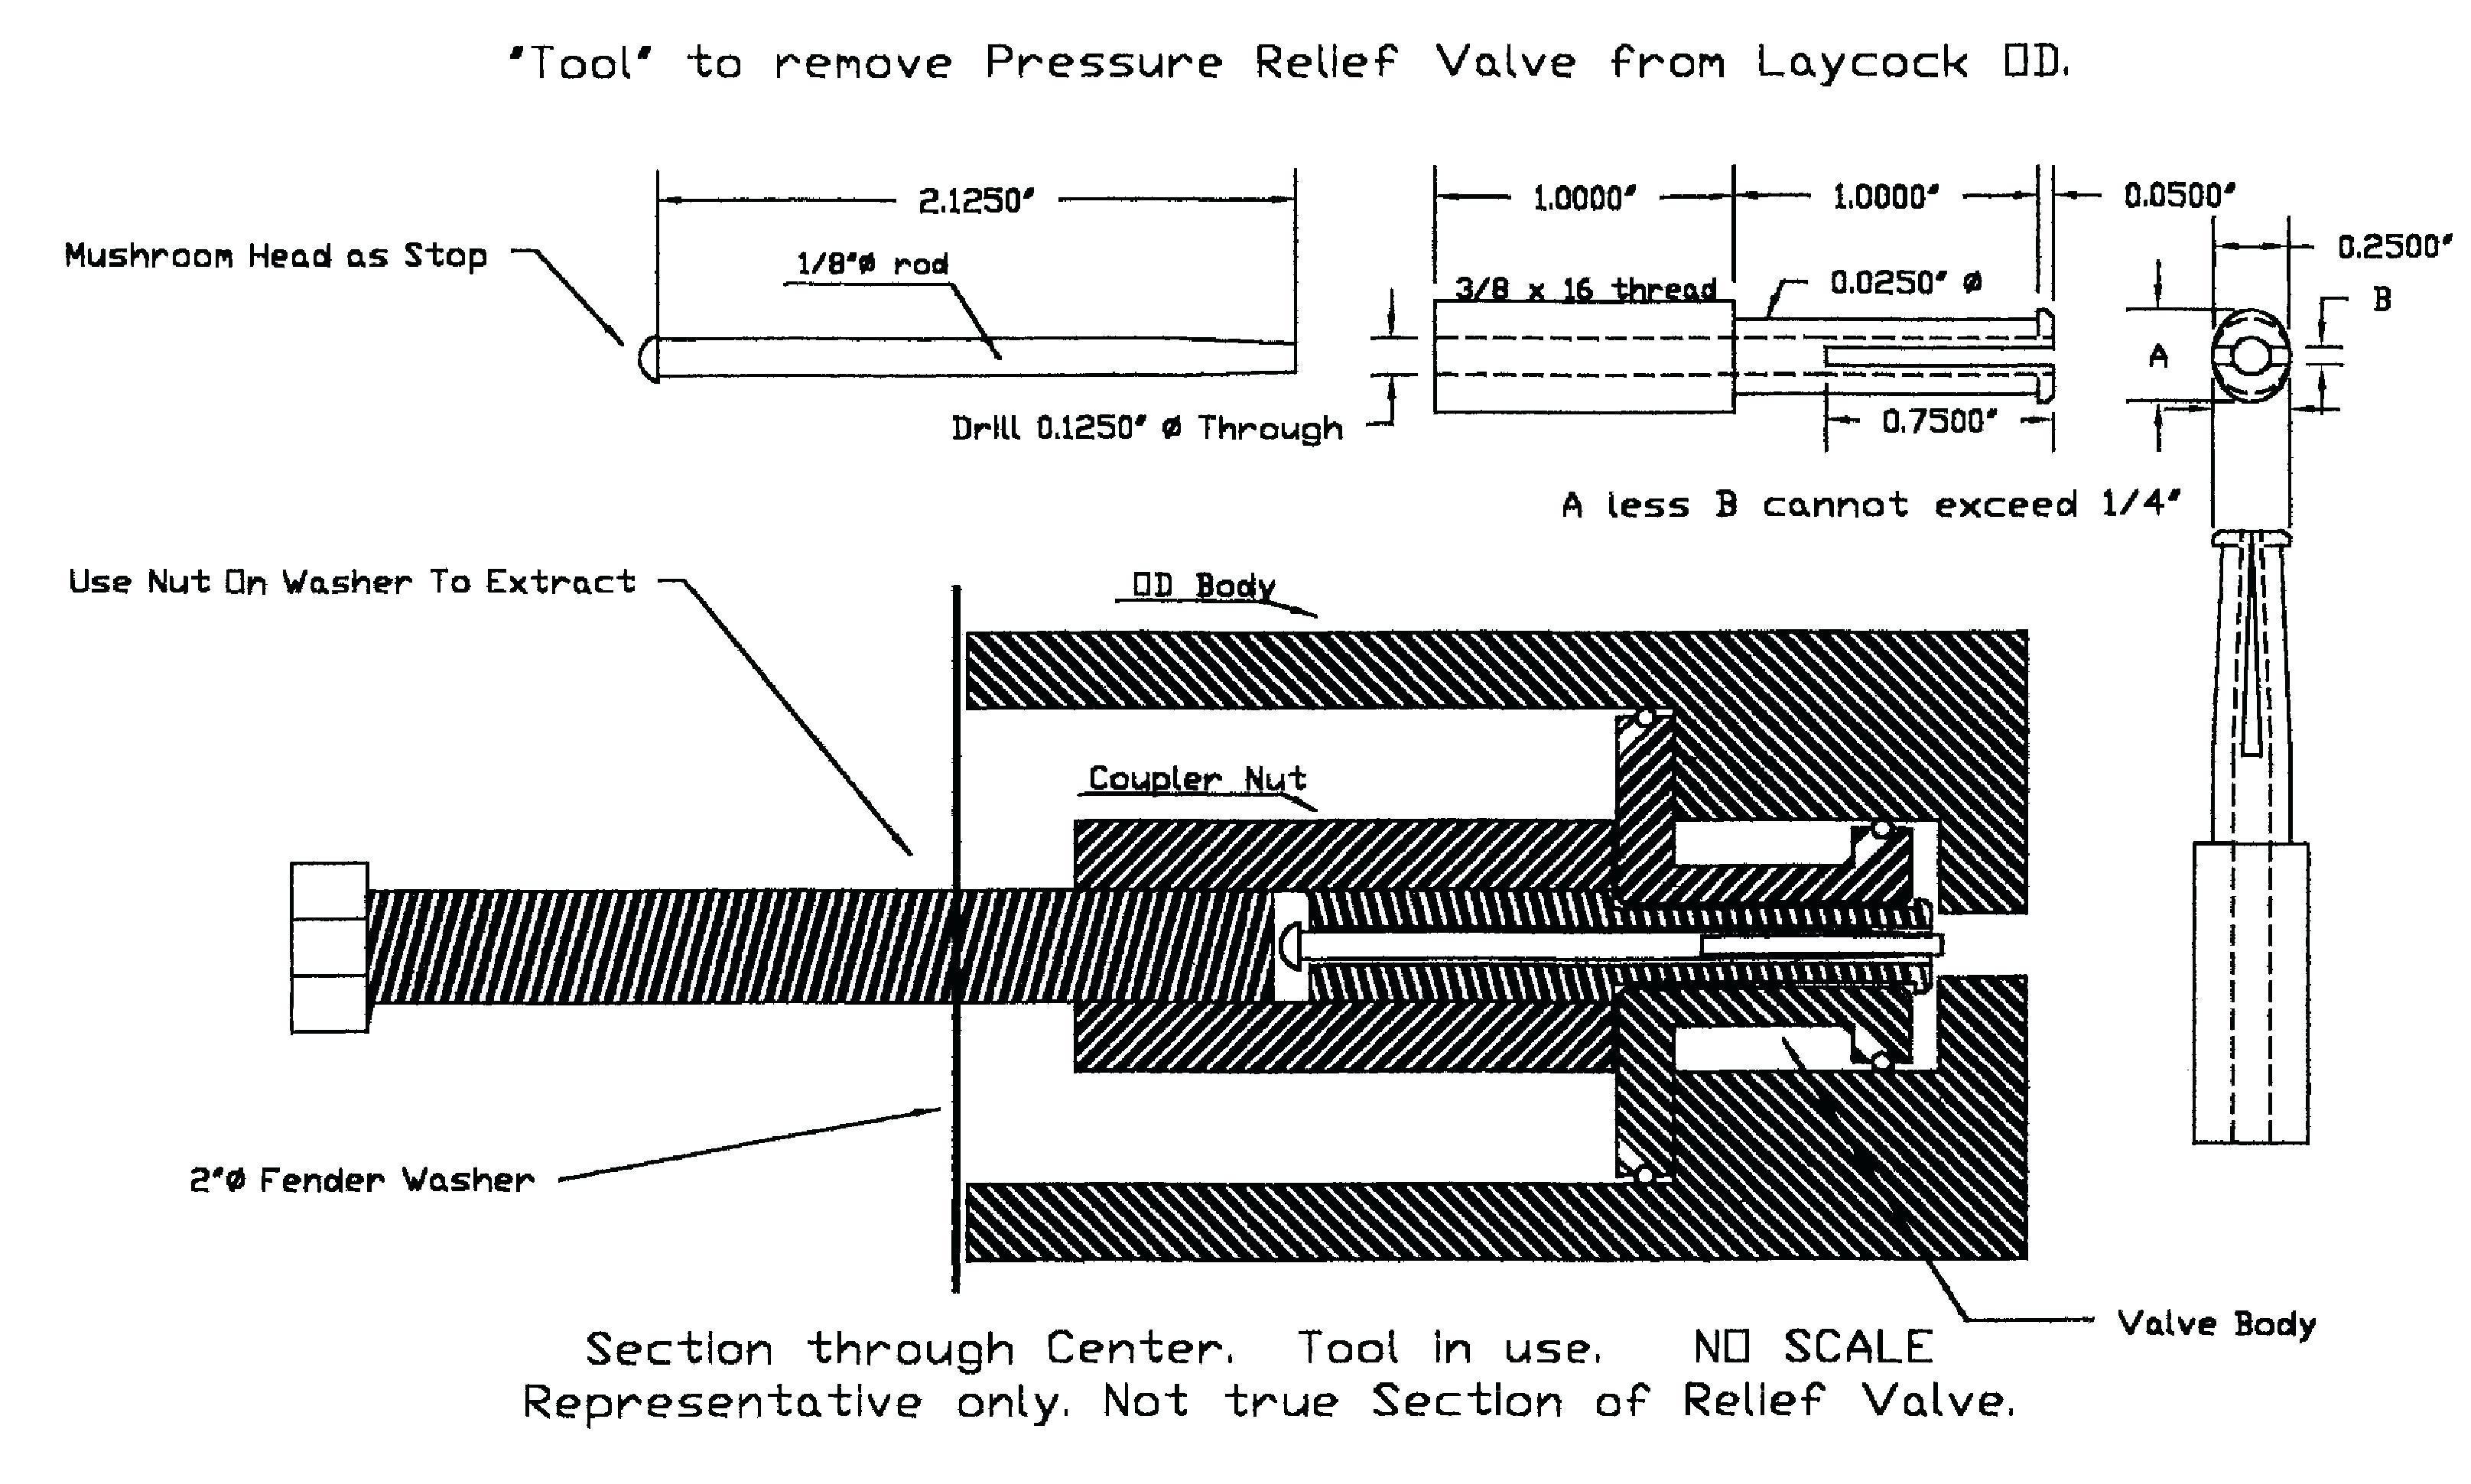 General Electric Motor Wiring Diagram Leeson Single Phase Motor Wiring Diagram Simplified Shapes Wiring Of General Electric Motor Wiring Diagram